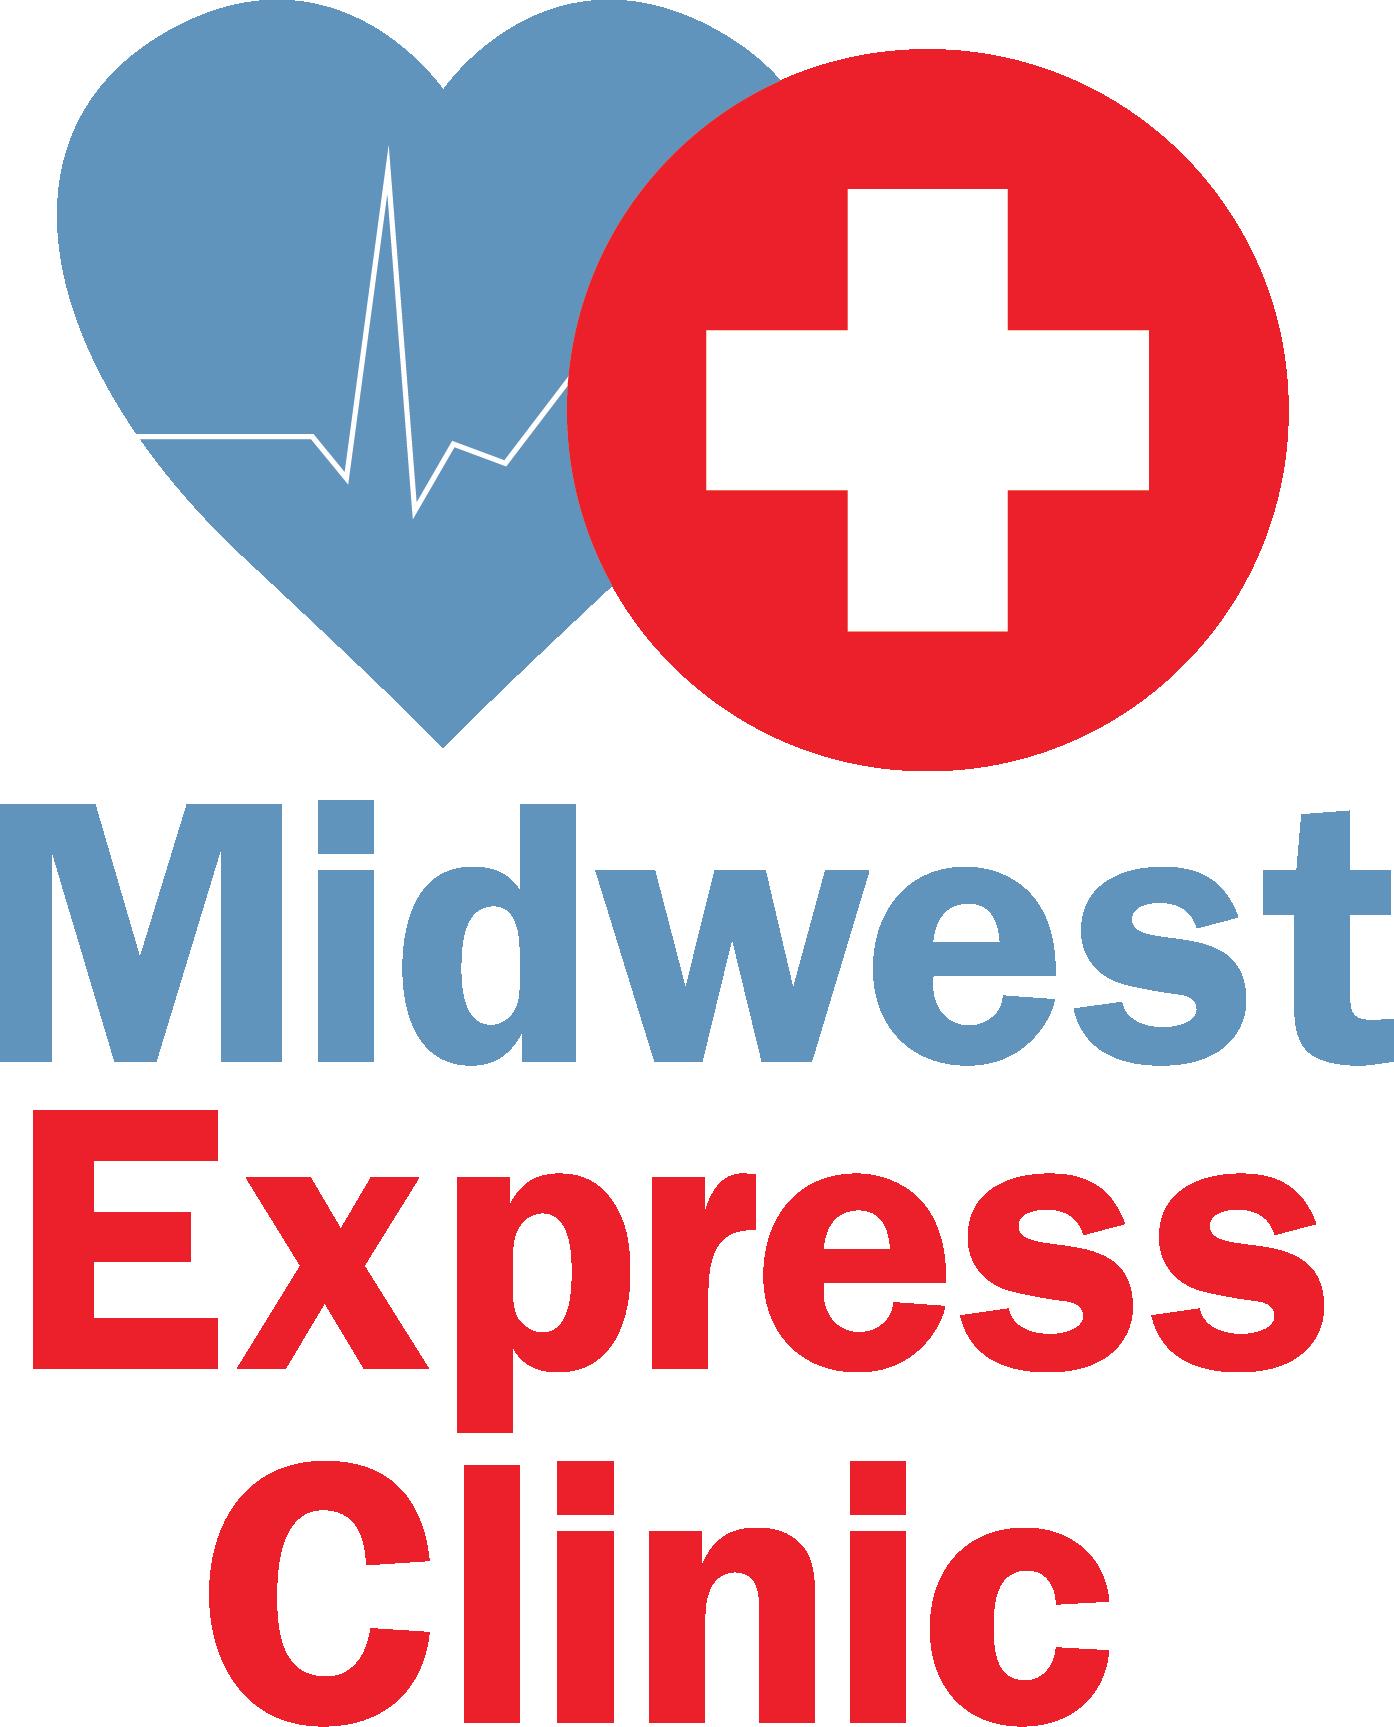 Midwest Express Clinic - Willowbrook Logo